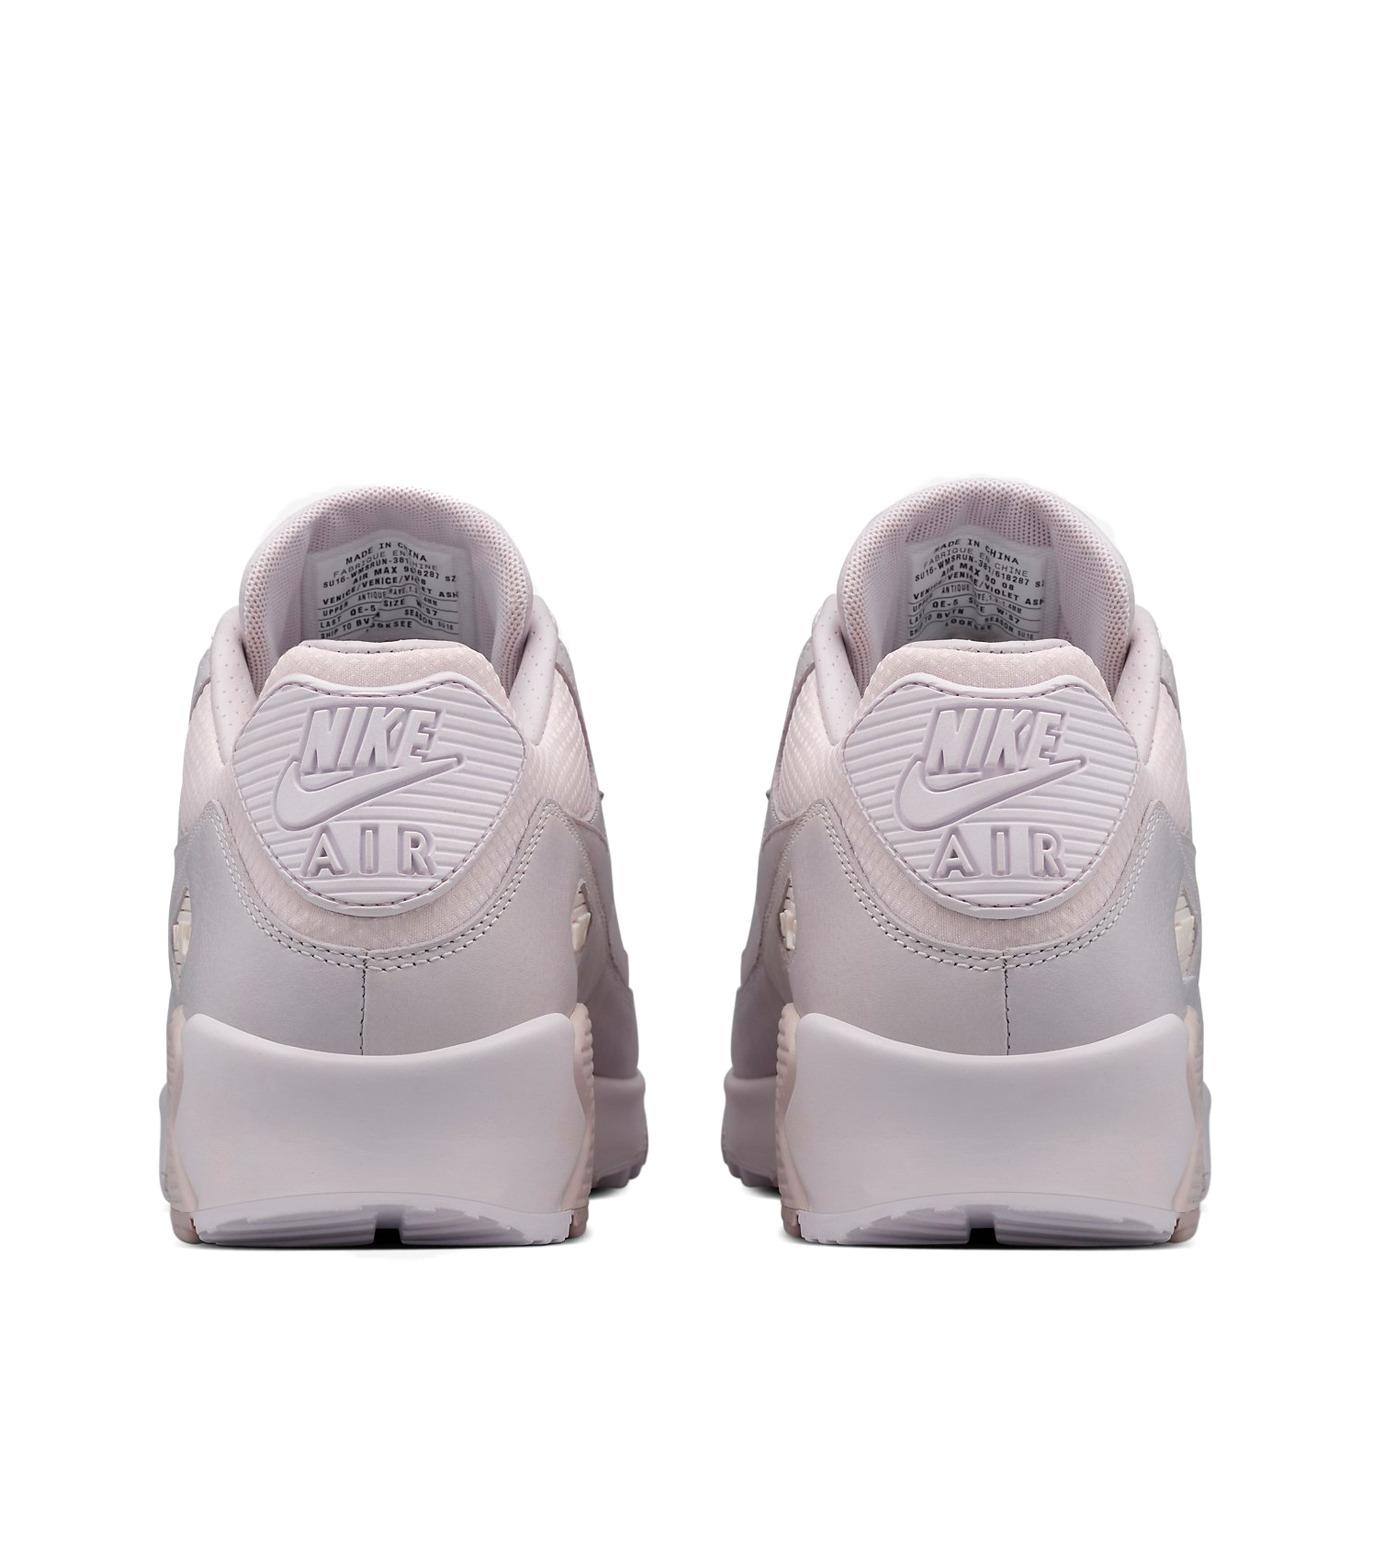 NIKE(ナイキ)のWMNS AIR MAX 90 Pinnacle-LIGHT GRAY(シューズ/shoes)-839612-500-10 拡大詳細画像5